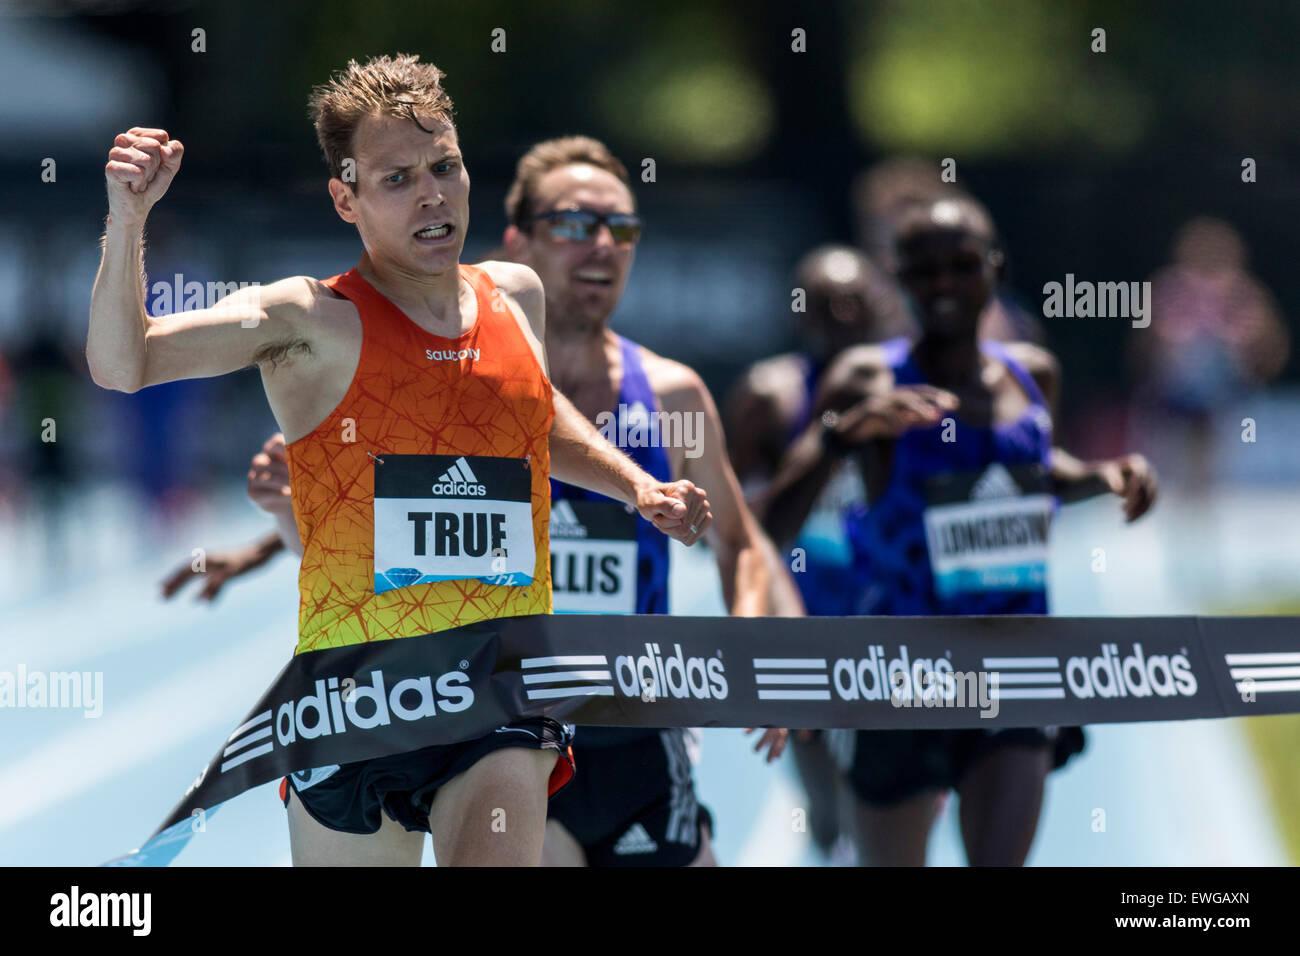 93d5ca24fed4 Ben True (USA) defeats Nick Willis (NZL) in the Men s 5000m at the 2015  Adidas NYC Diamond League Grand Prix